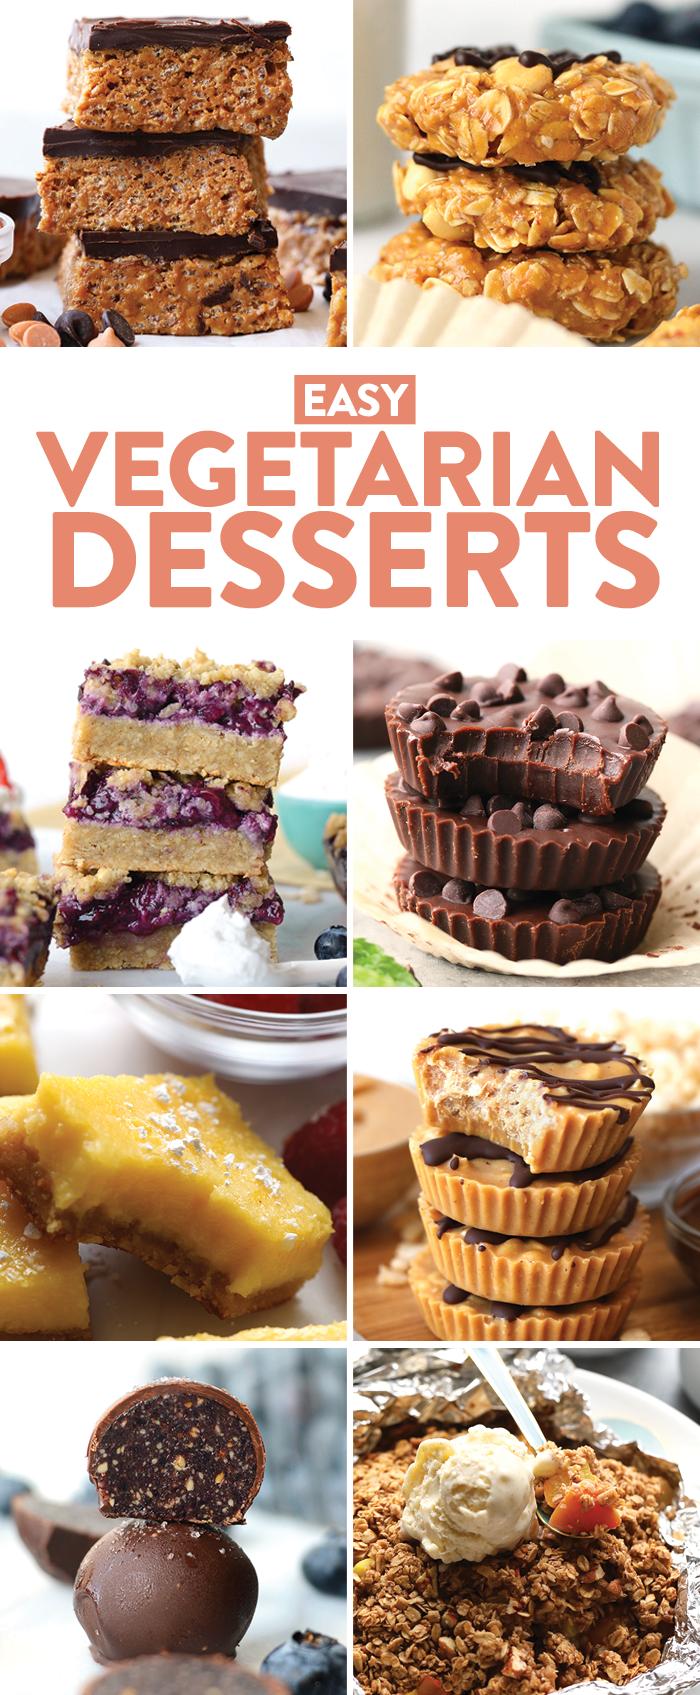 8 easy vegetarian dessert recipe ideas.